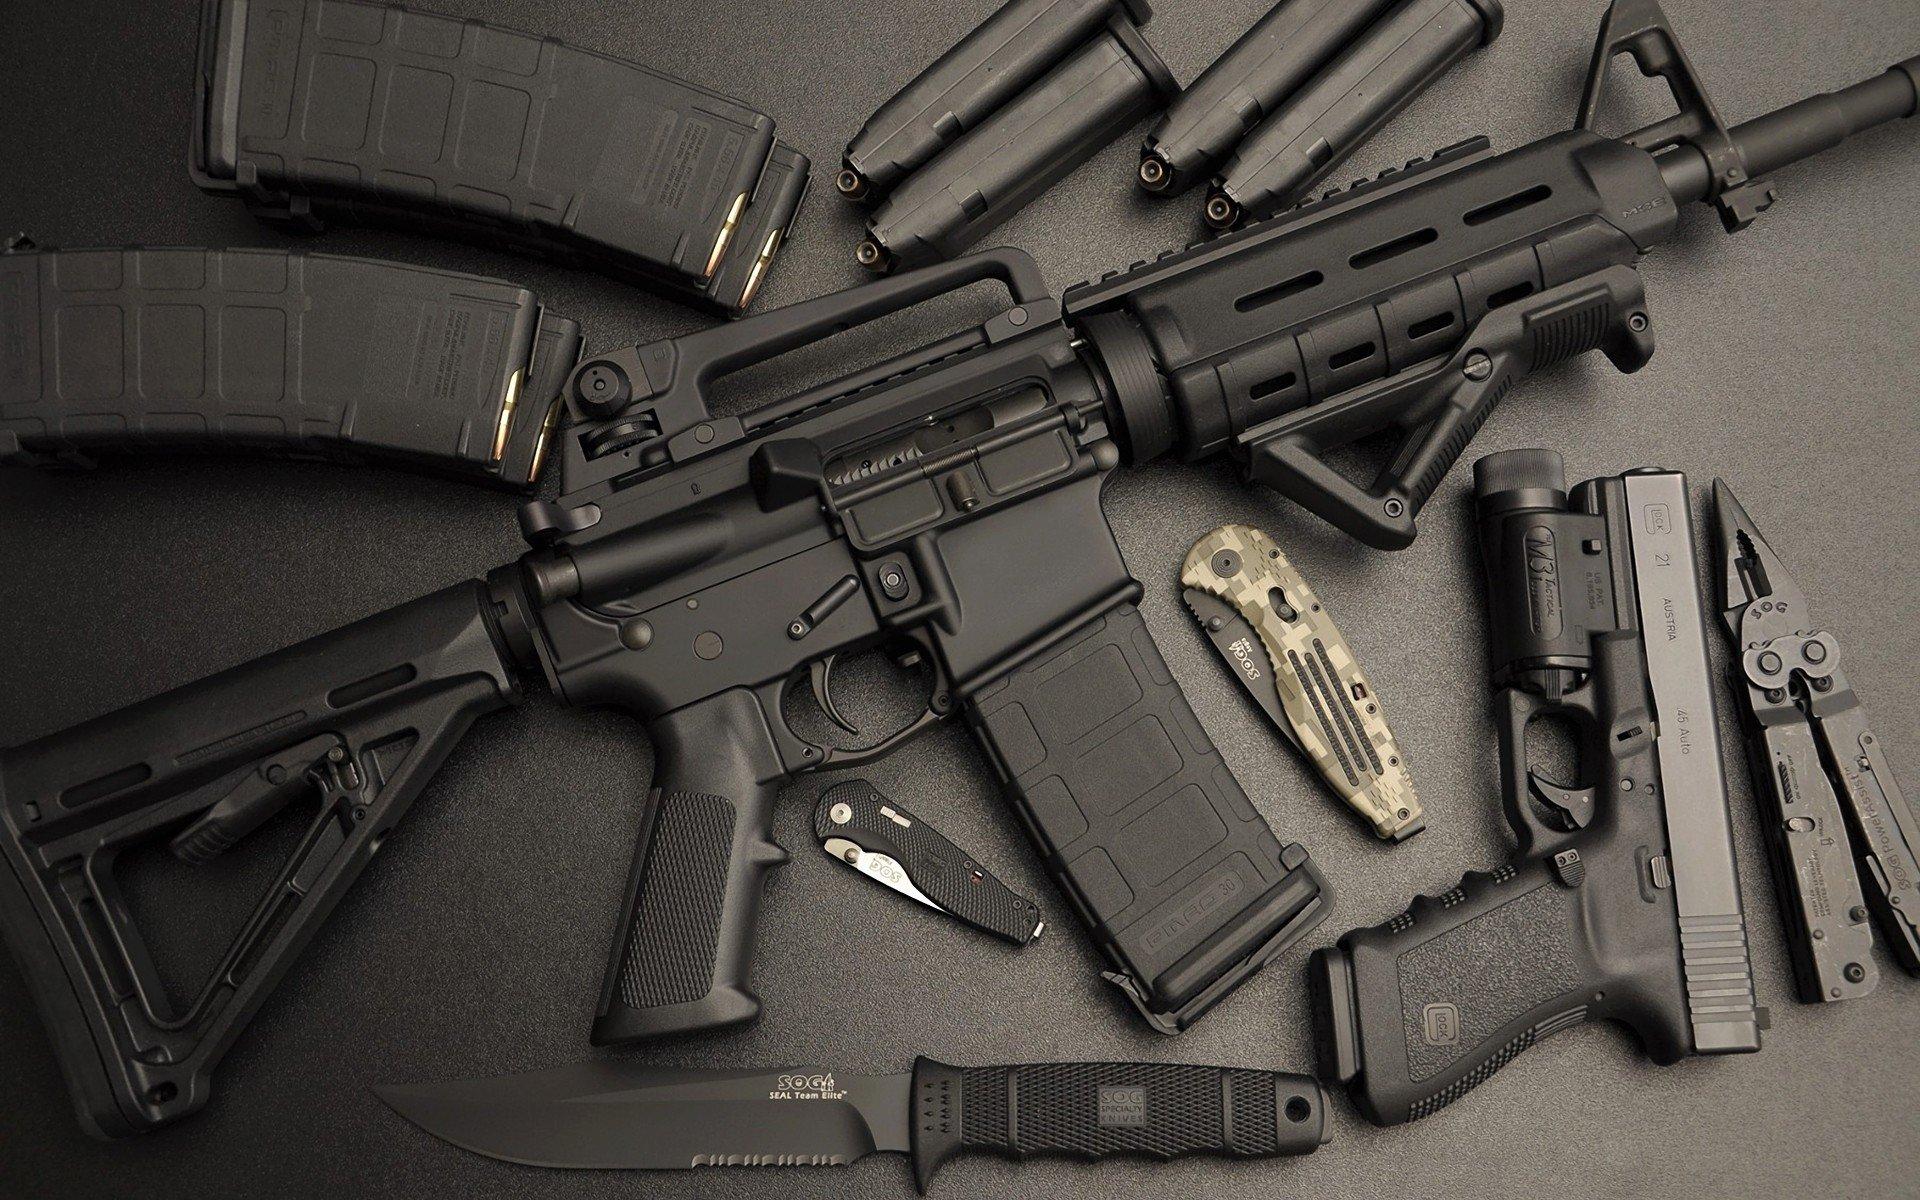 Assault rifle, Pistol, Glock, AR 15